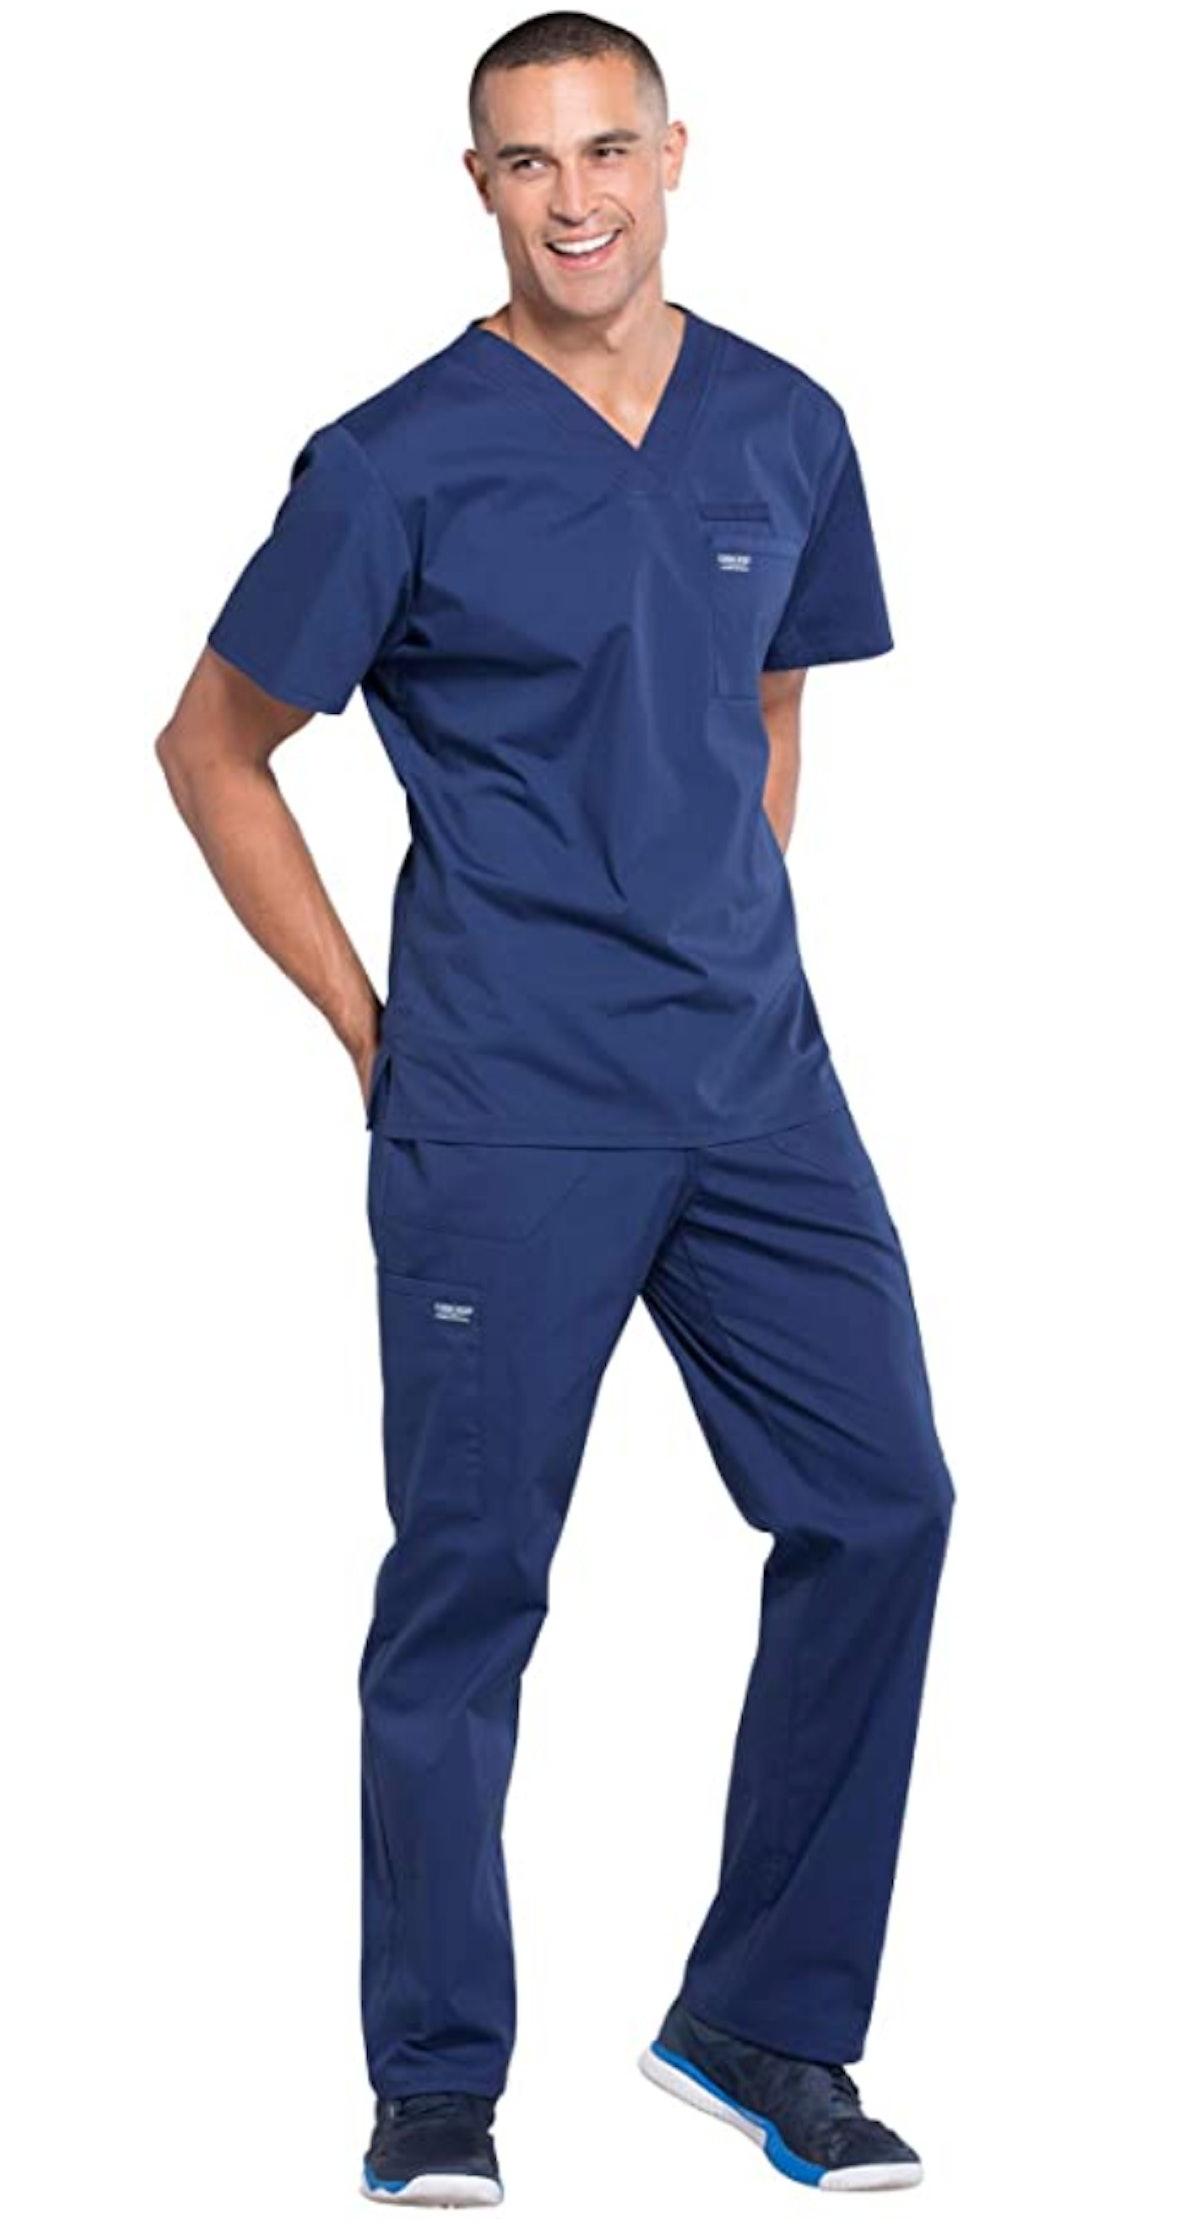 Ted Mullins often wears his scrubs on 'Schitt's Creek.'